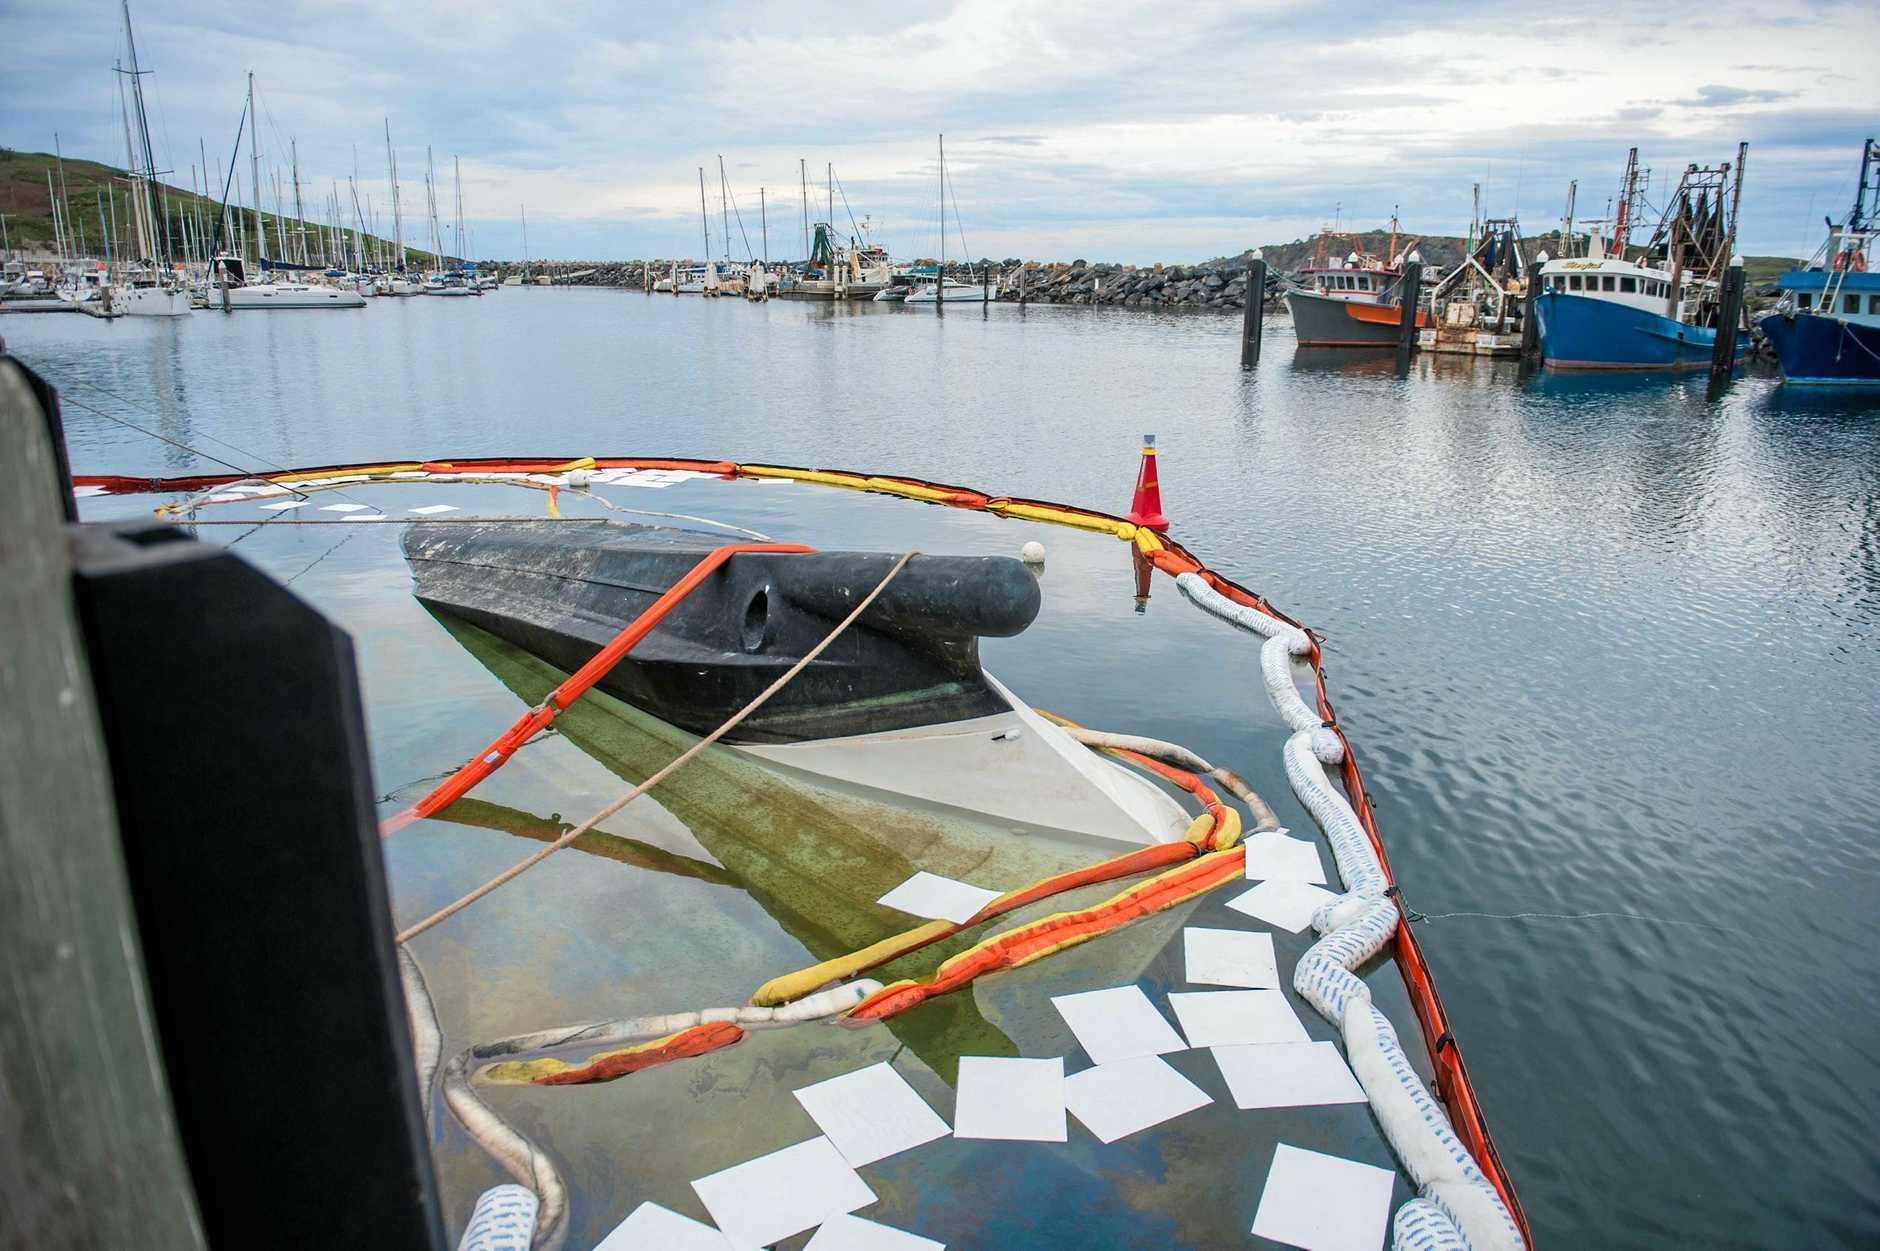 Capsized boat awaits removal in the marina.